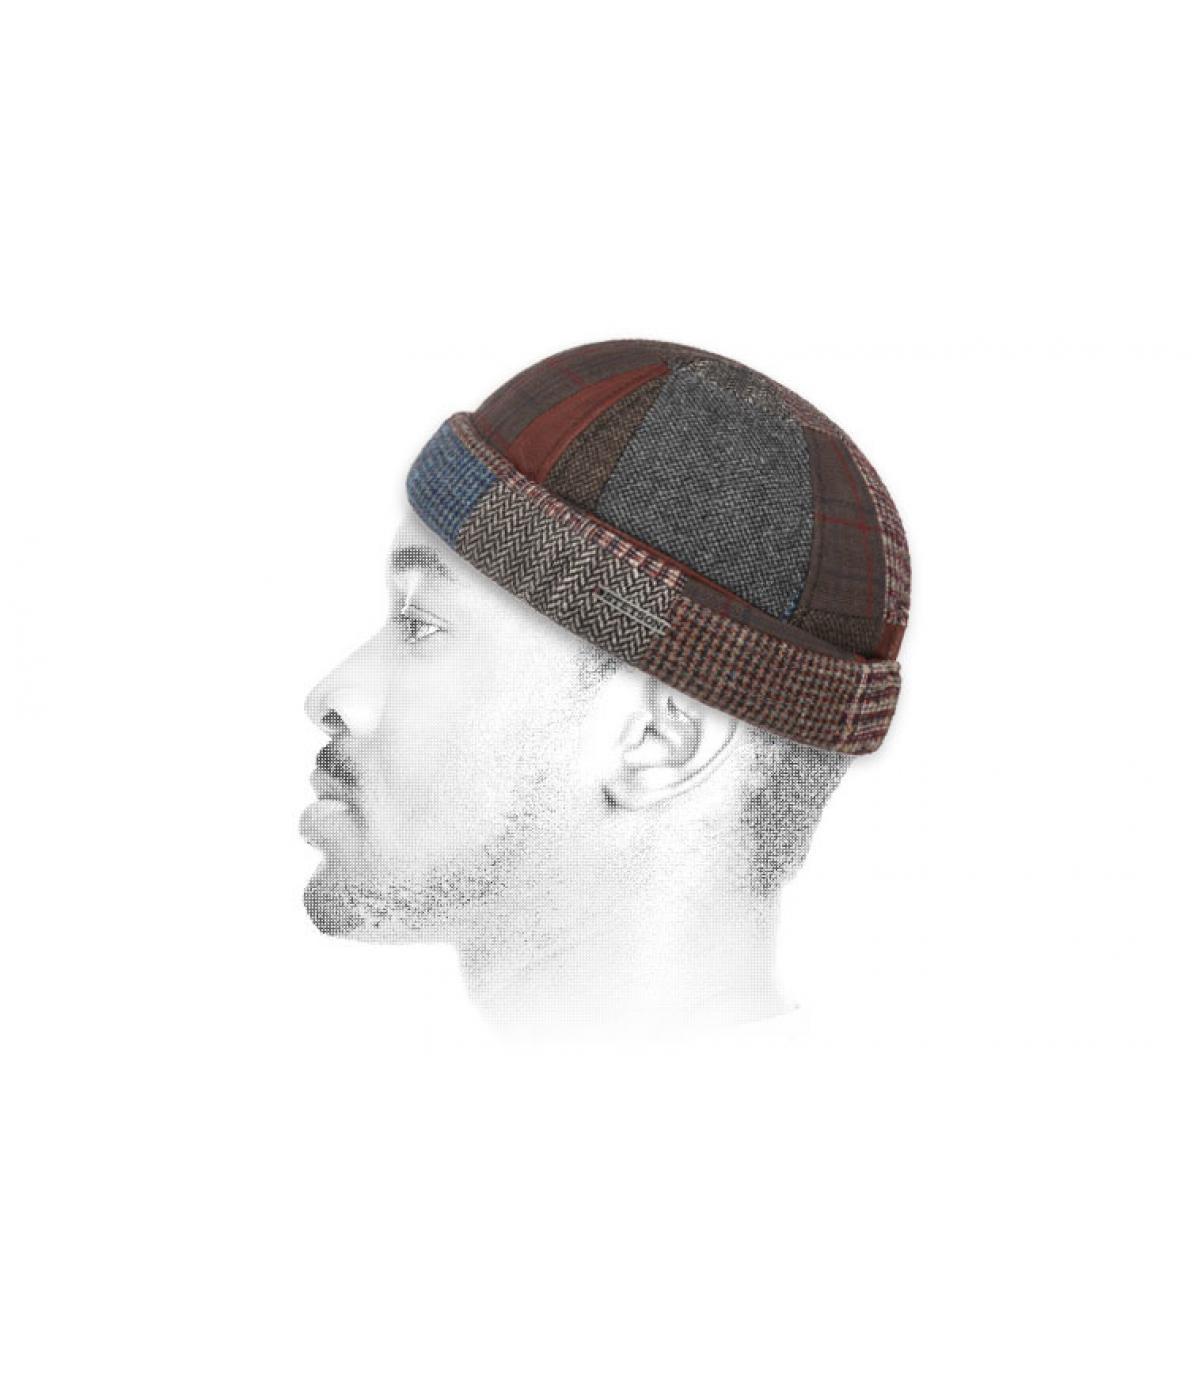 pelle di vacchetta patchwork cappello di lana